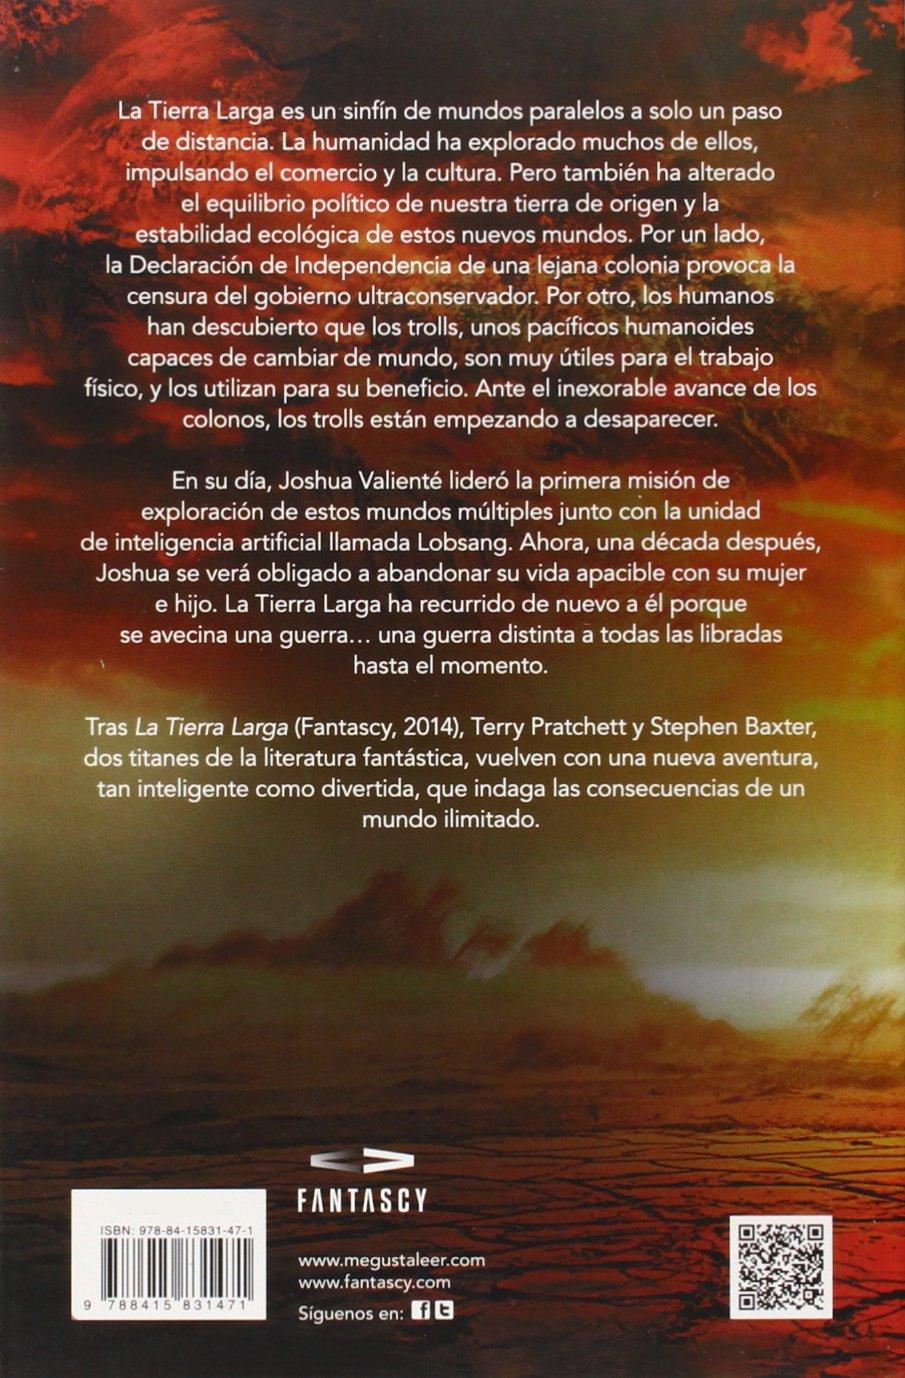 La Guerra Larga (La Tierra Larga 2) (FANTASCY): Amazon.es: Terry Pratchett, Stephen Baxter, Gabriel Dols Gallardo;: Libros